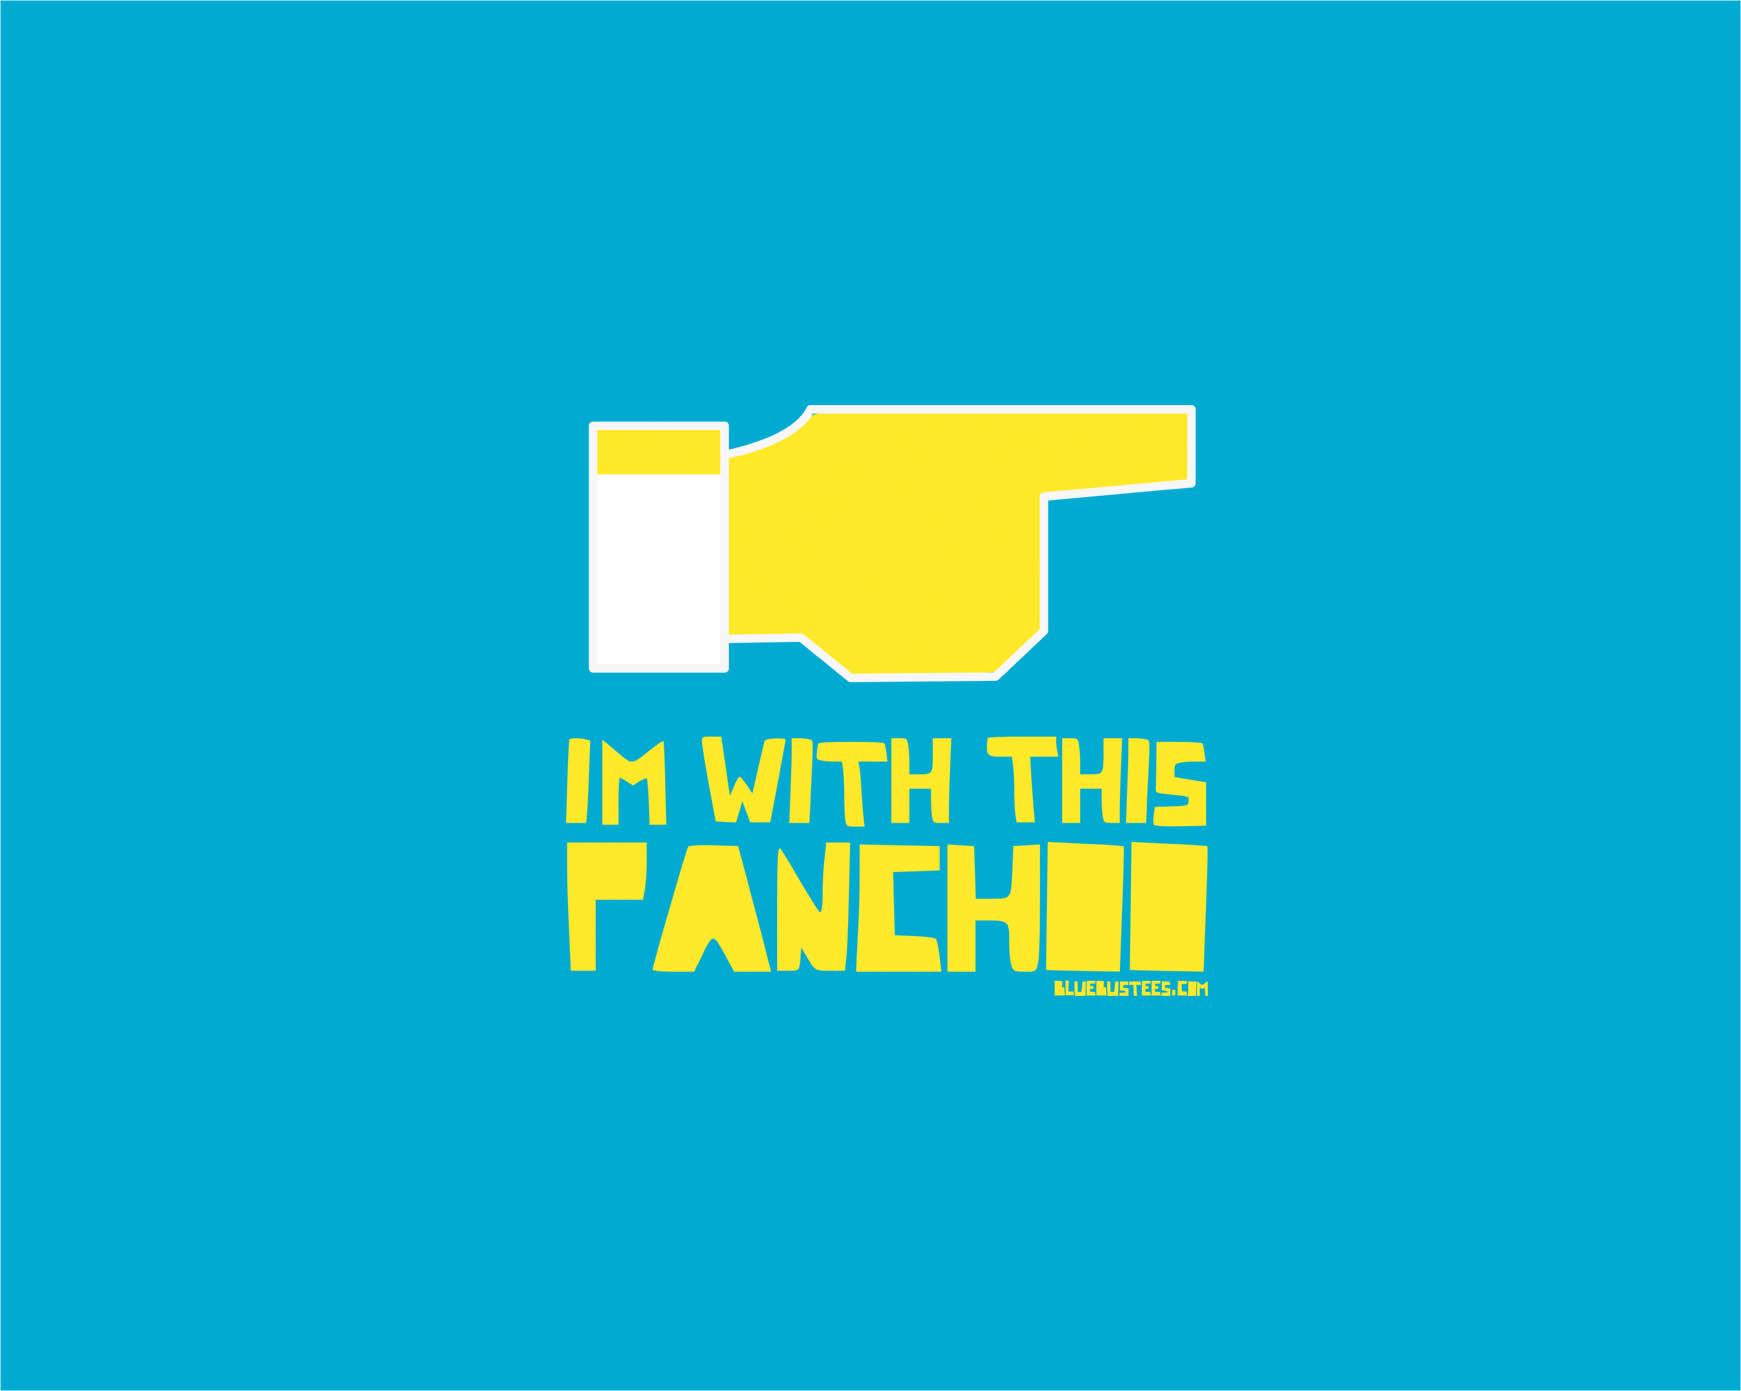 PANCHOO